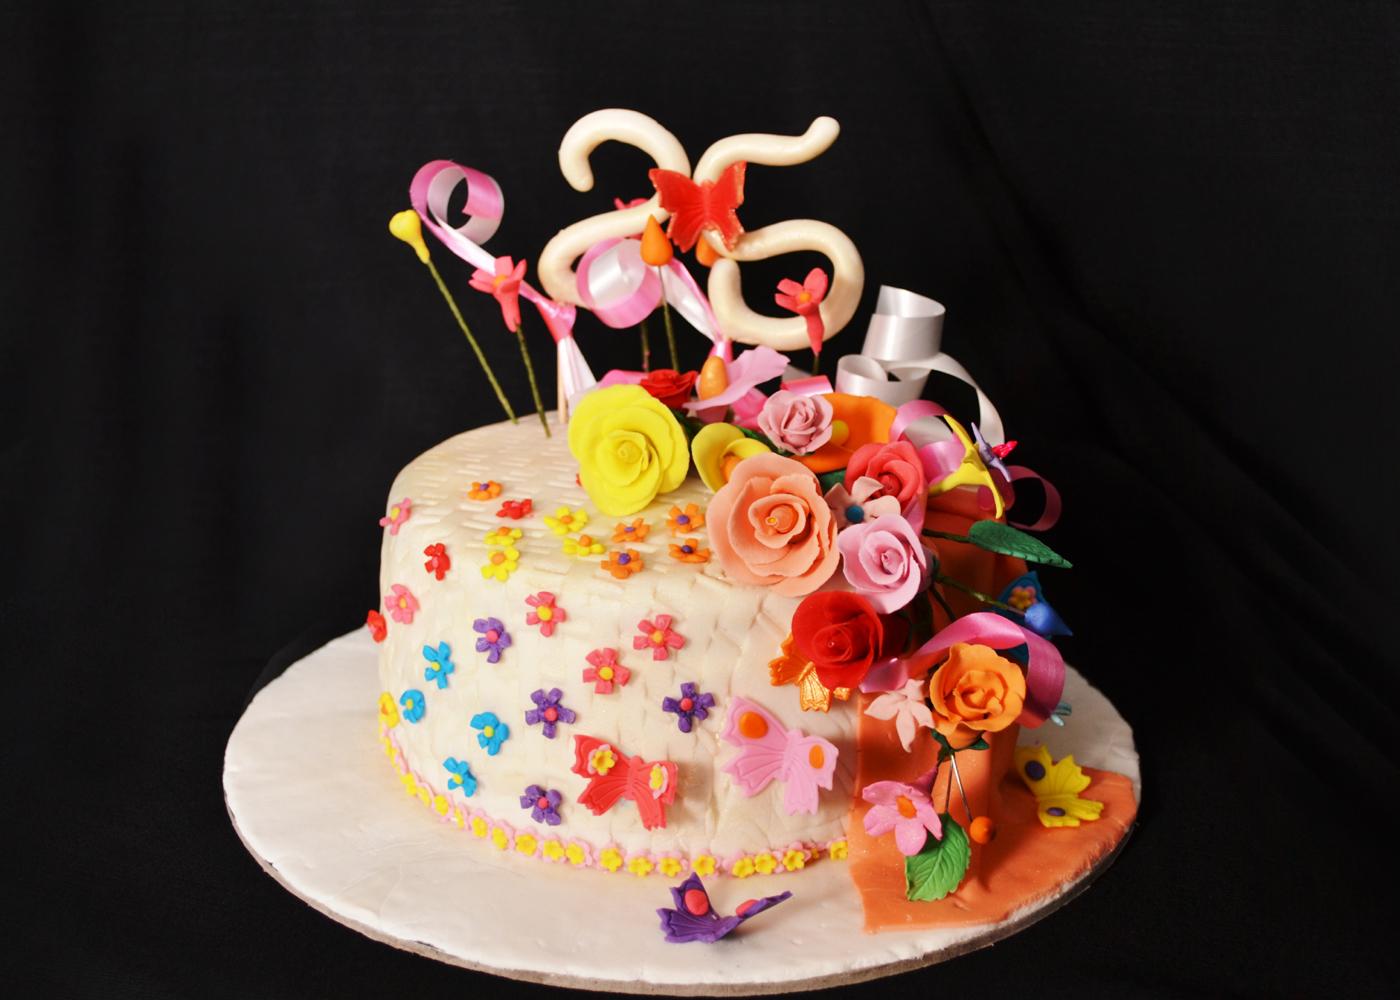 Fondant Cake Decorating Classes In Delhi